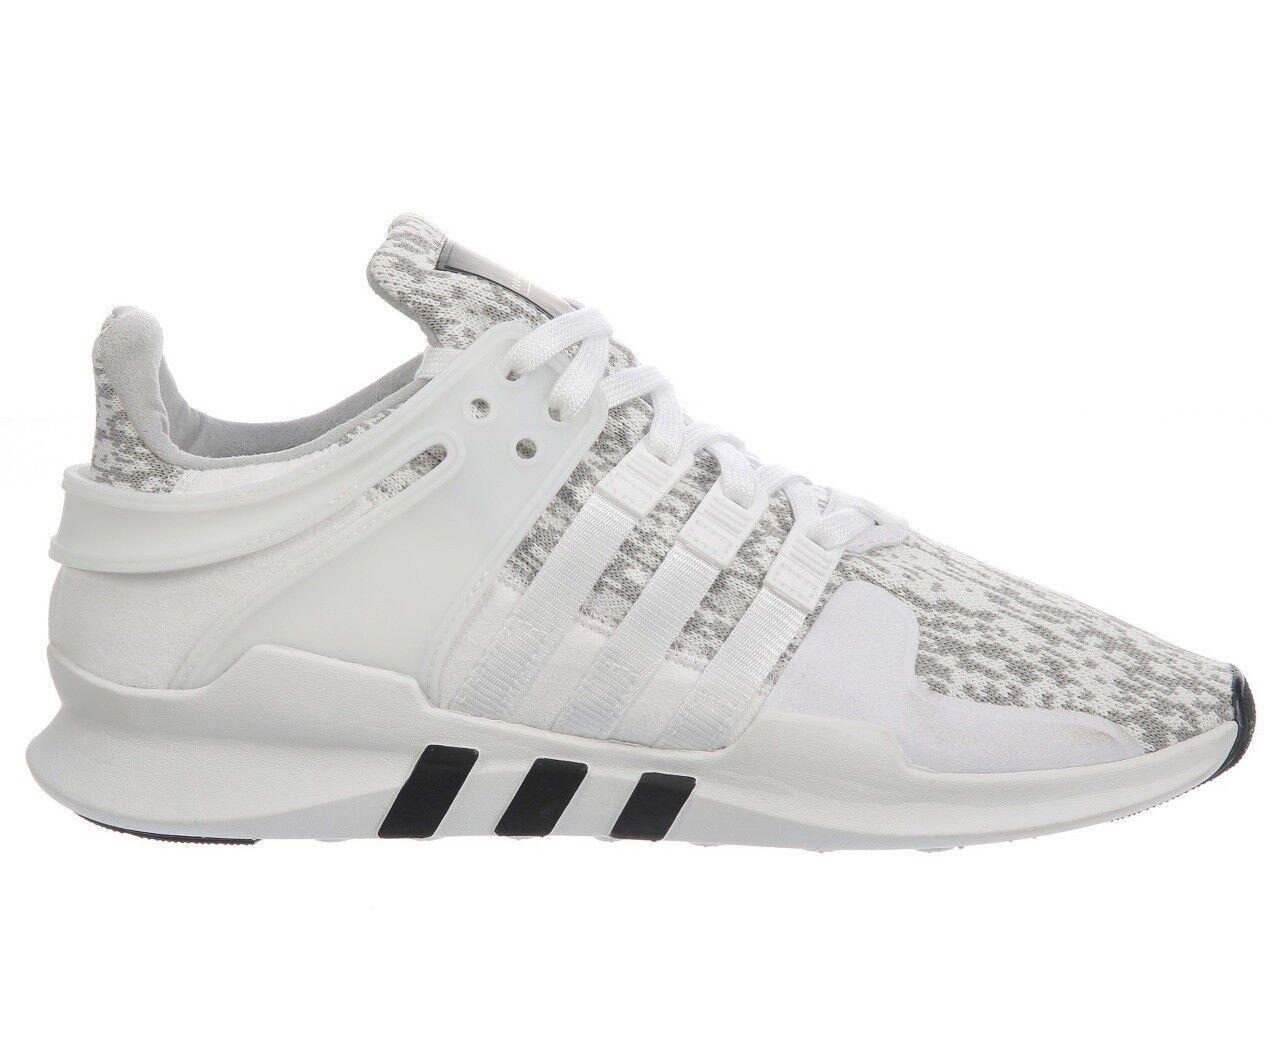 Adidas EQT ADV para hombre BB1305 claro Onix Support blancoooo de Punto Calzado para Correr